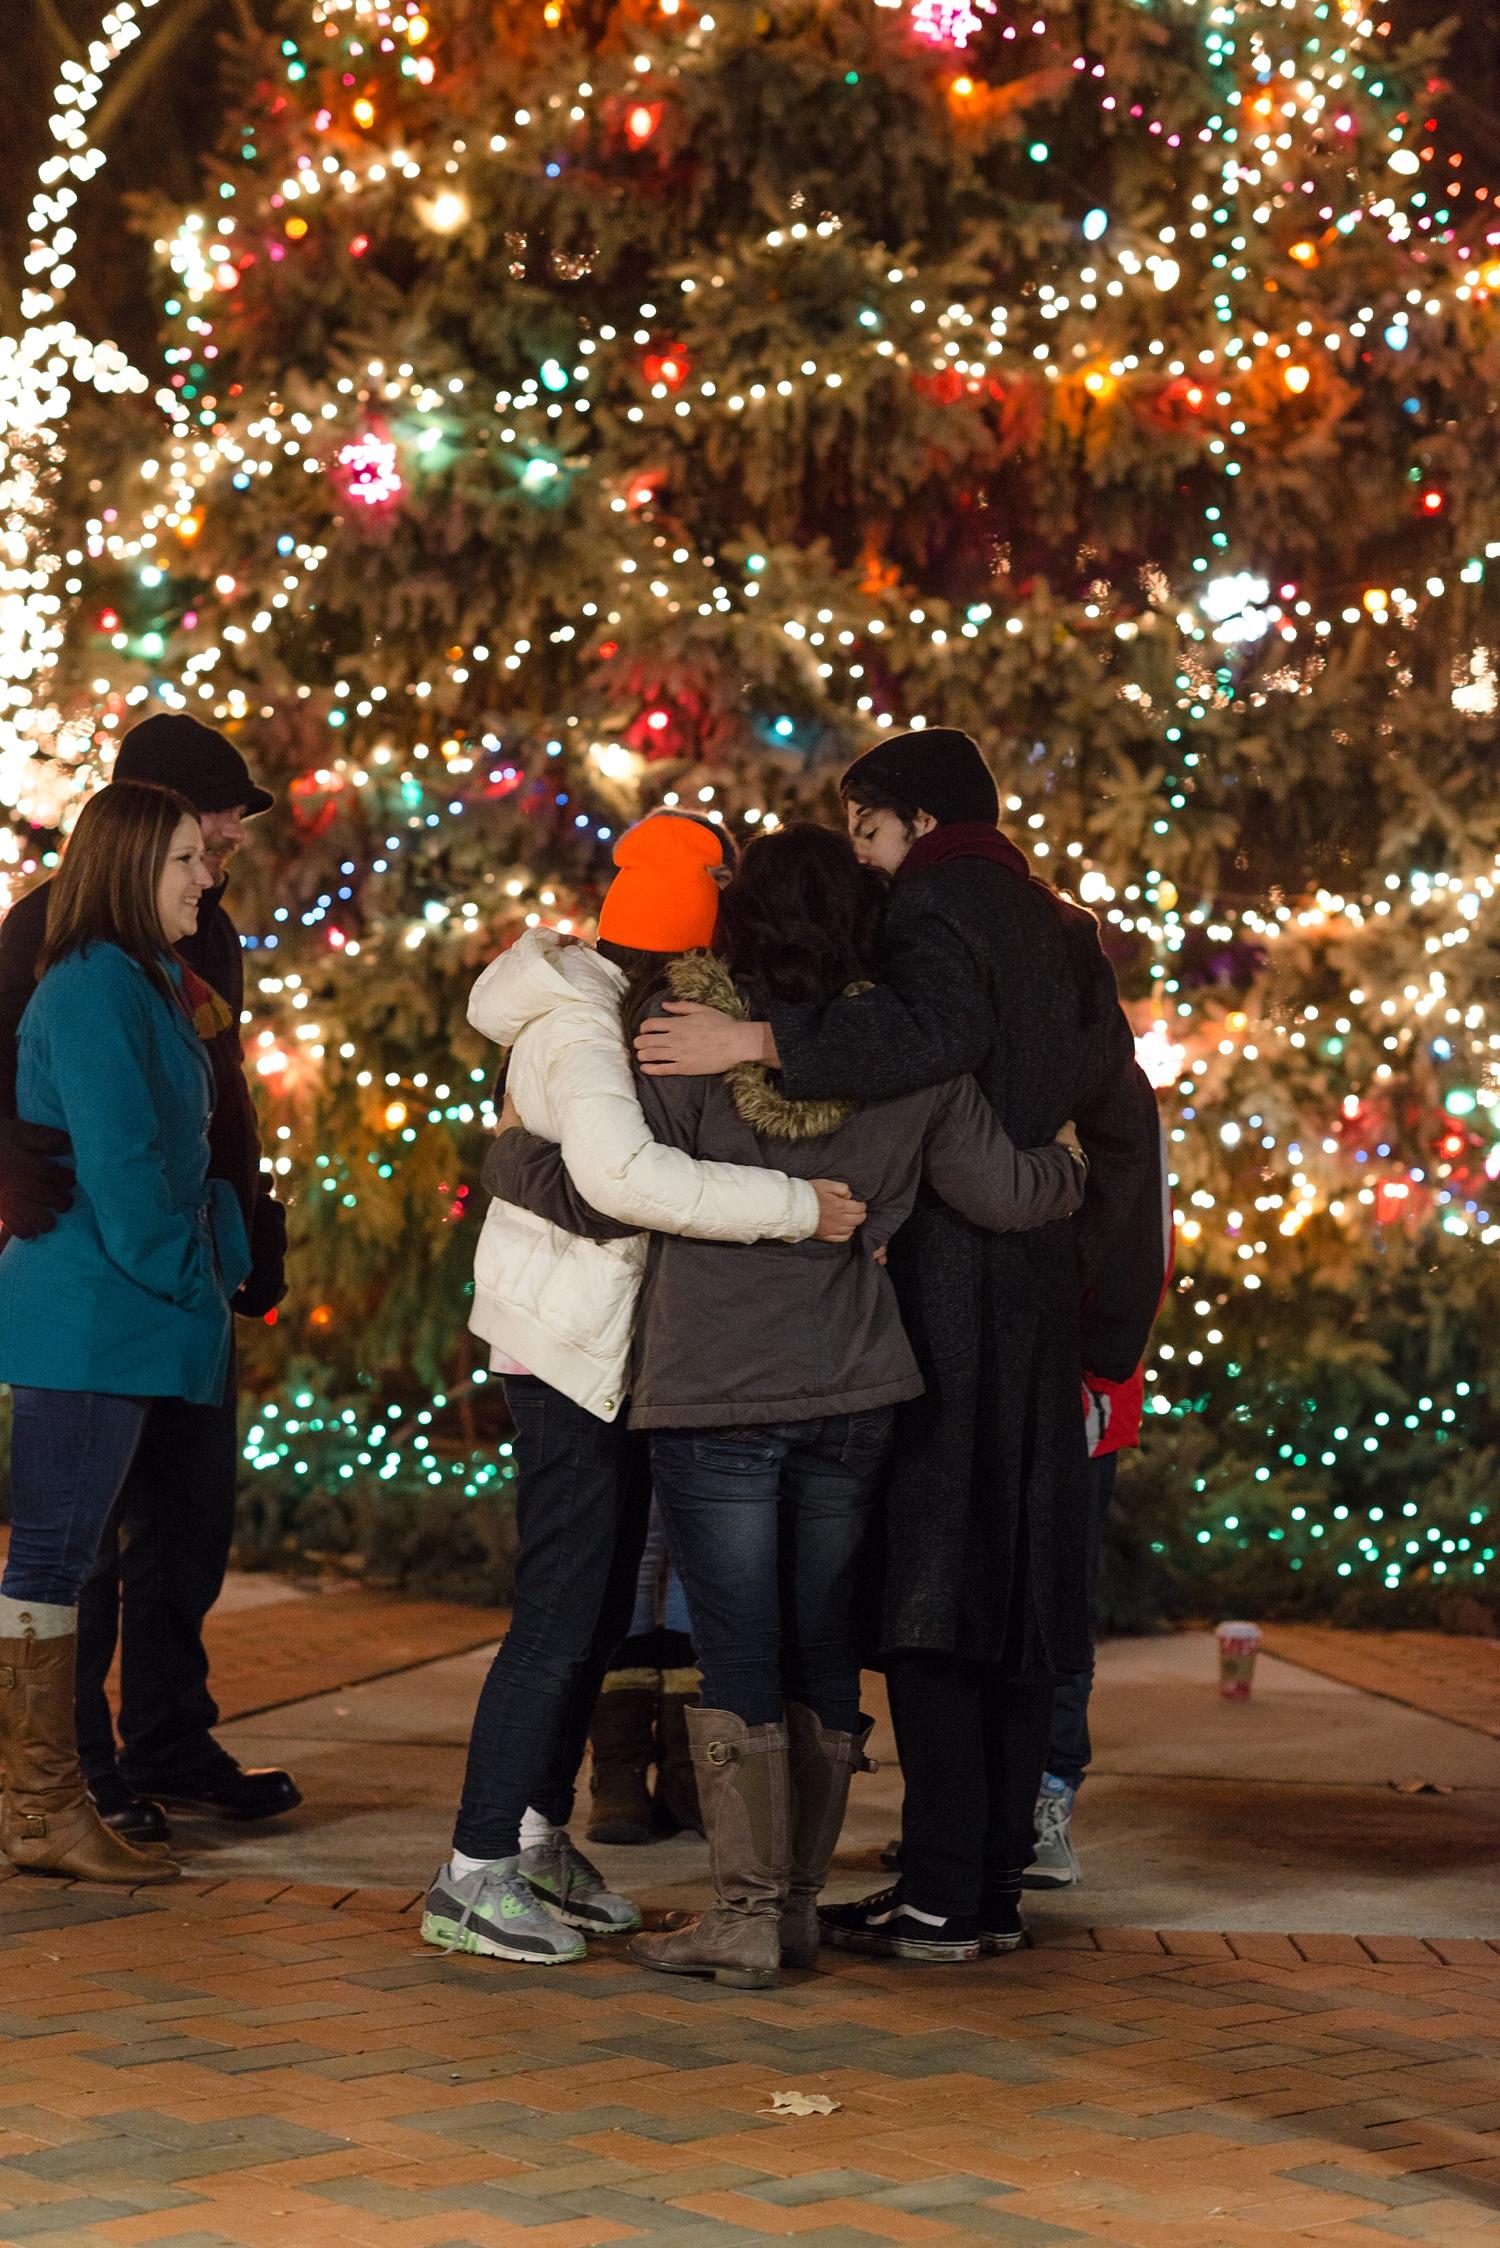 christmas proposal dayton ohio fraze pavilion andreabellstudioscom - Christmas Lights In Dayton Ohio